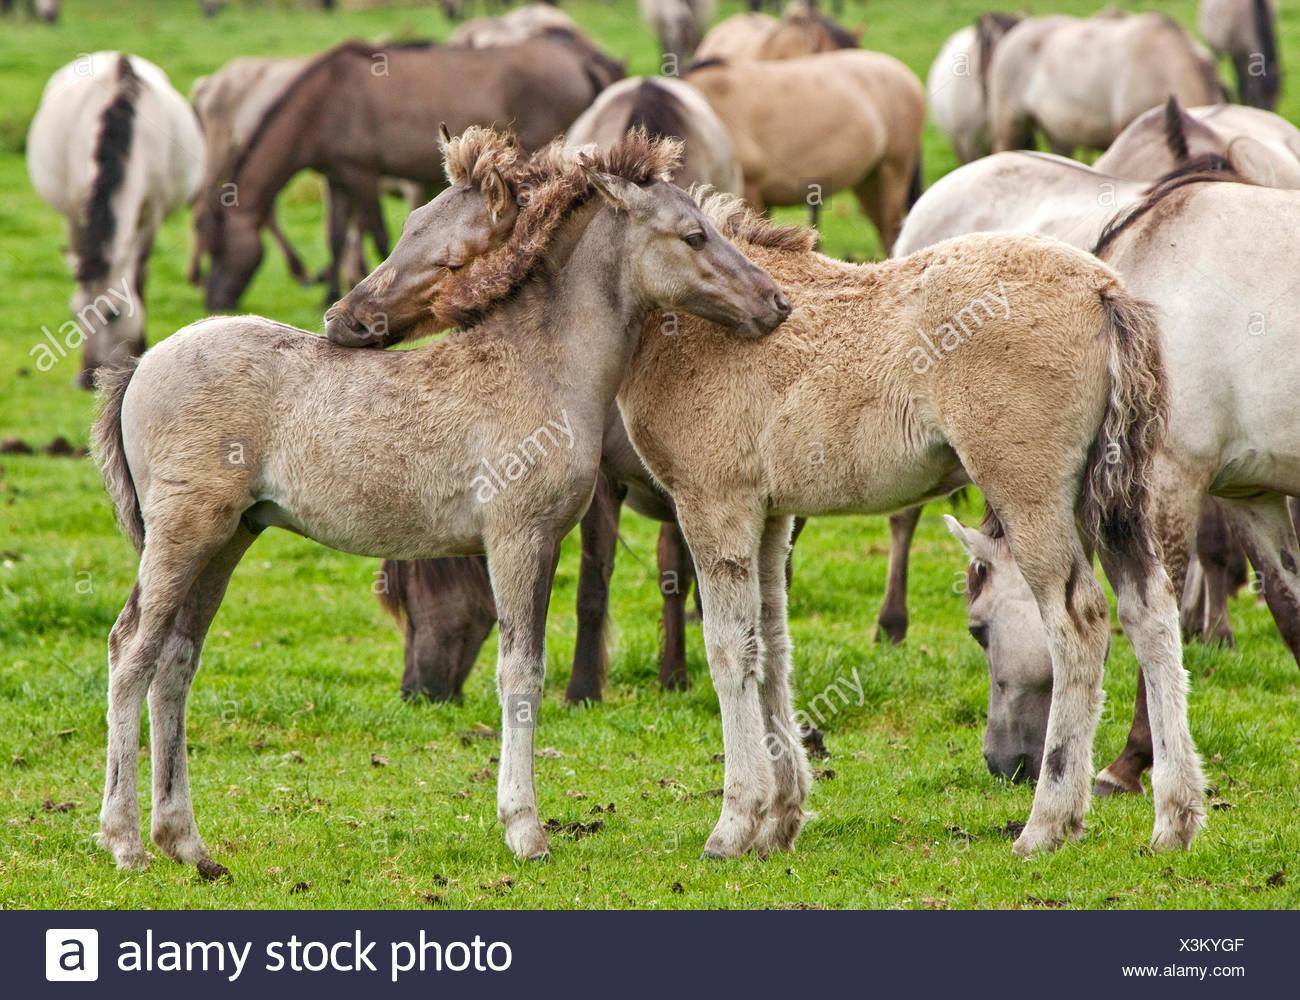 Duelmen pony, Dulmen pony, Duelmener Wildpferd, Dulmener Wildpferd (Equus przewalskii f. caballus), foals in the herd of wild horses in Duelmen, Germany, North Rhine-Westphalia, Duelmen Stock Photo